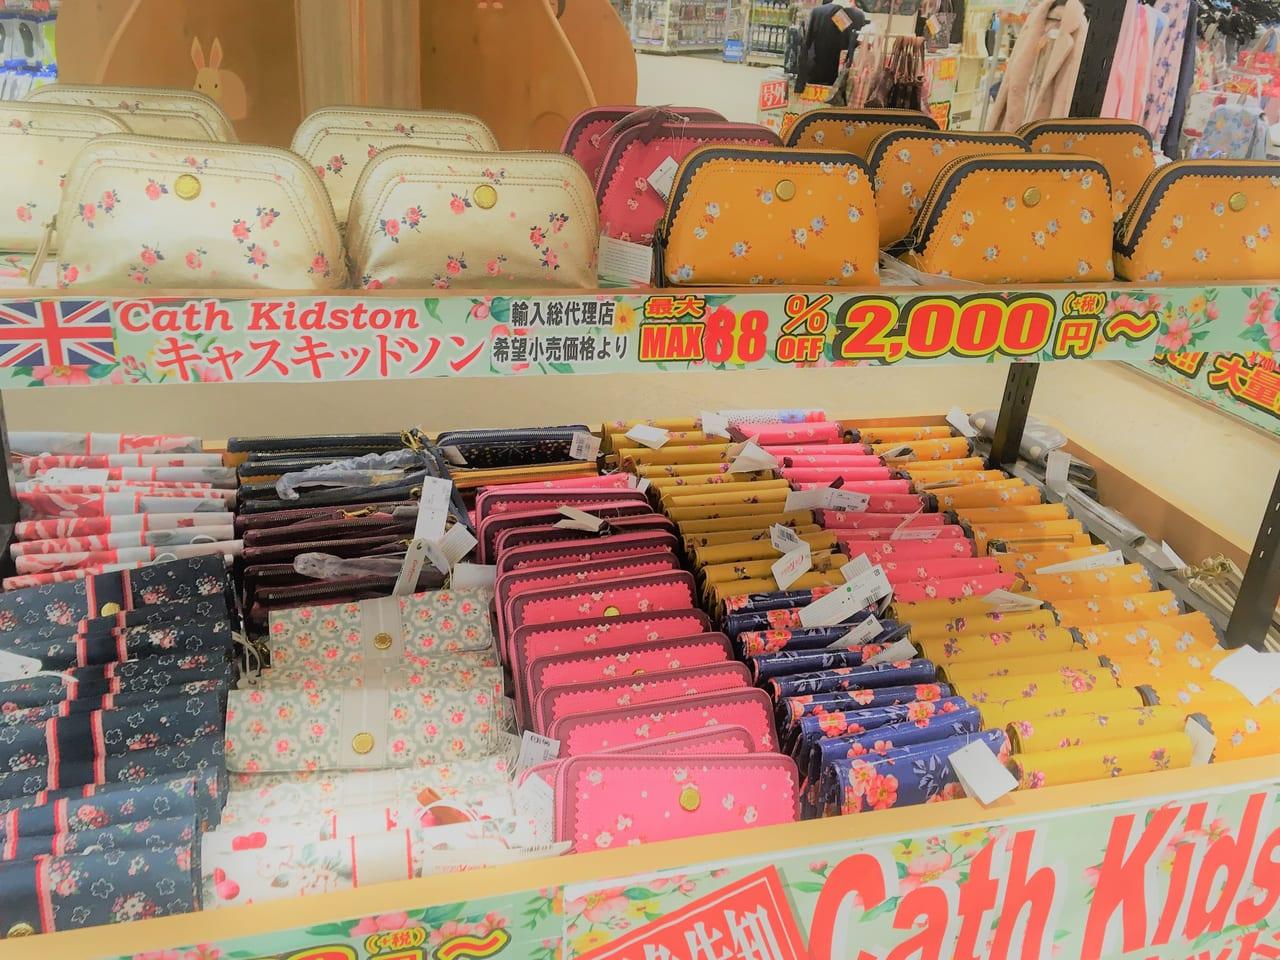 MEGAドン・キホーテUNY稲沢東店のキャスキッドソンの財布